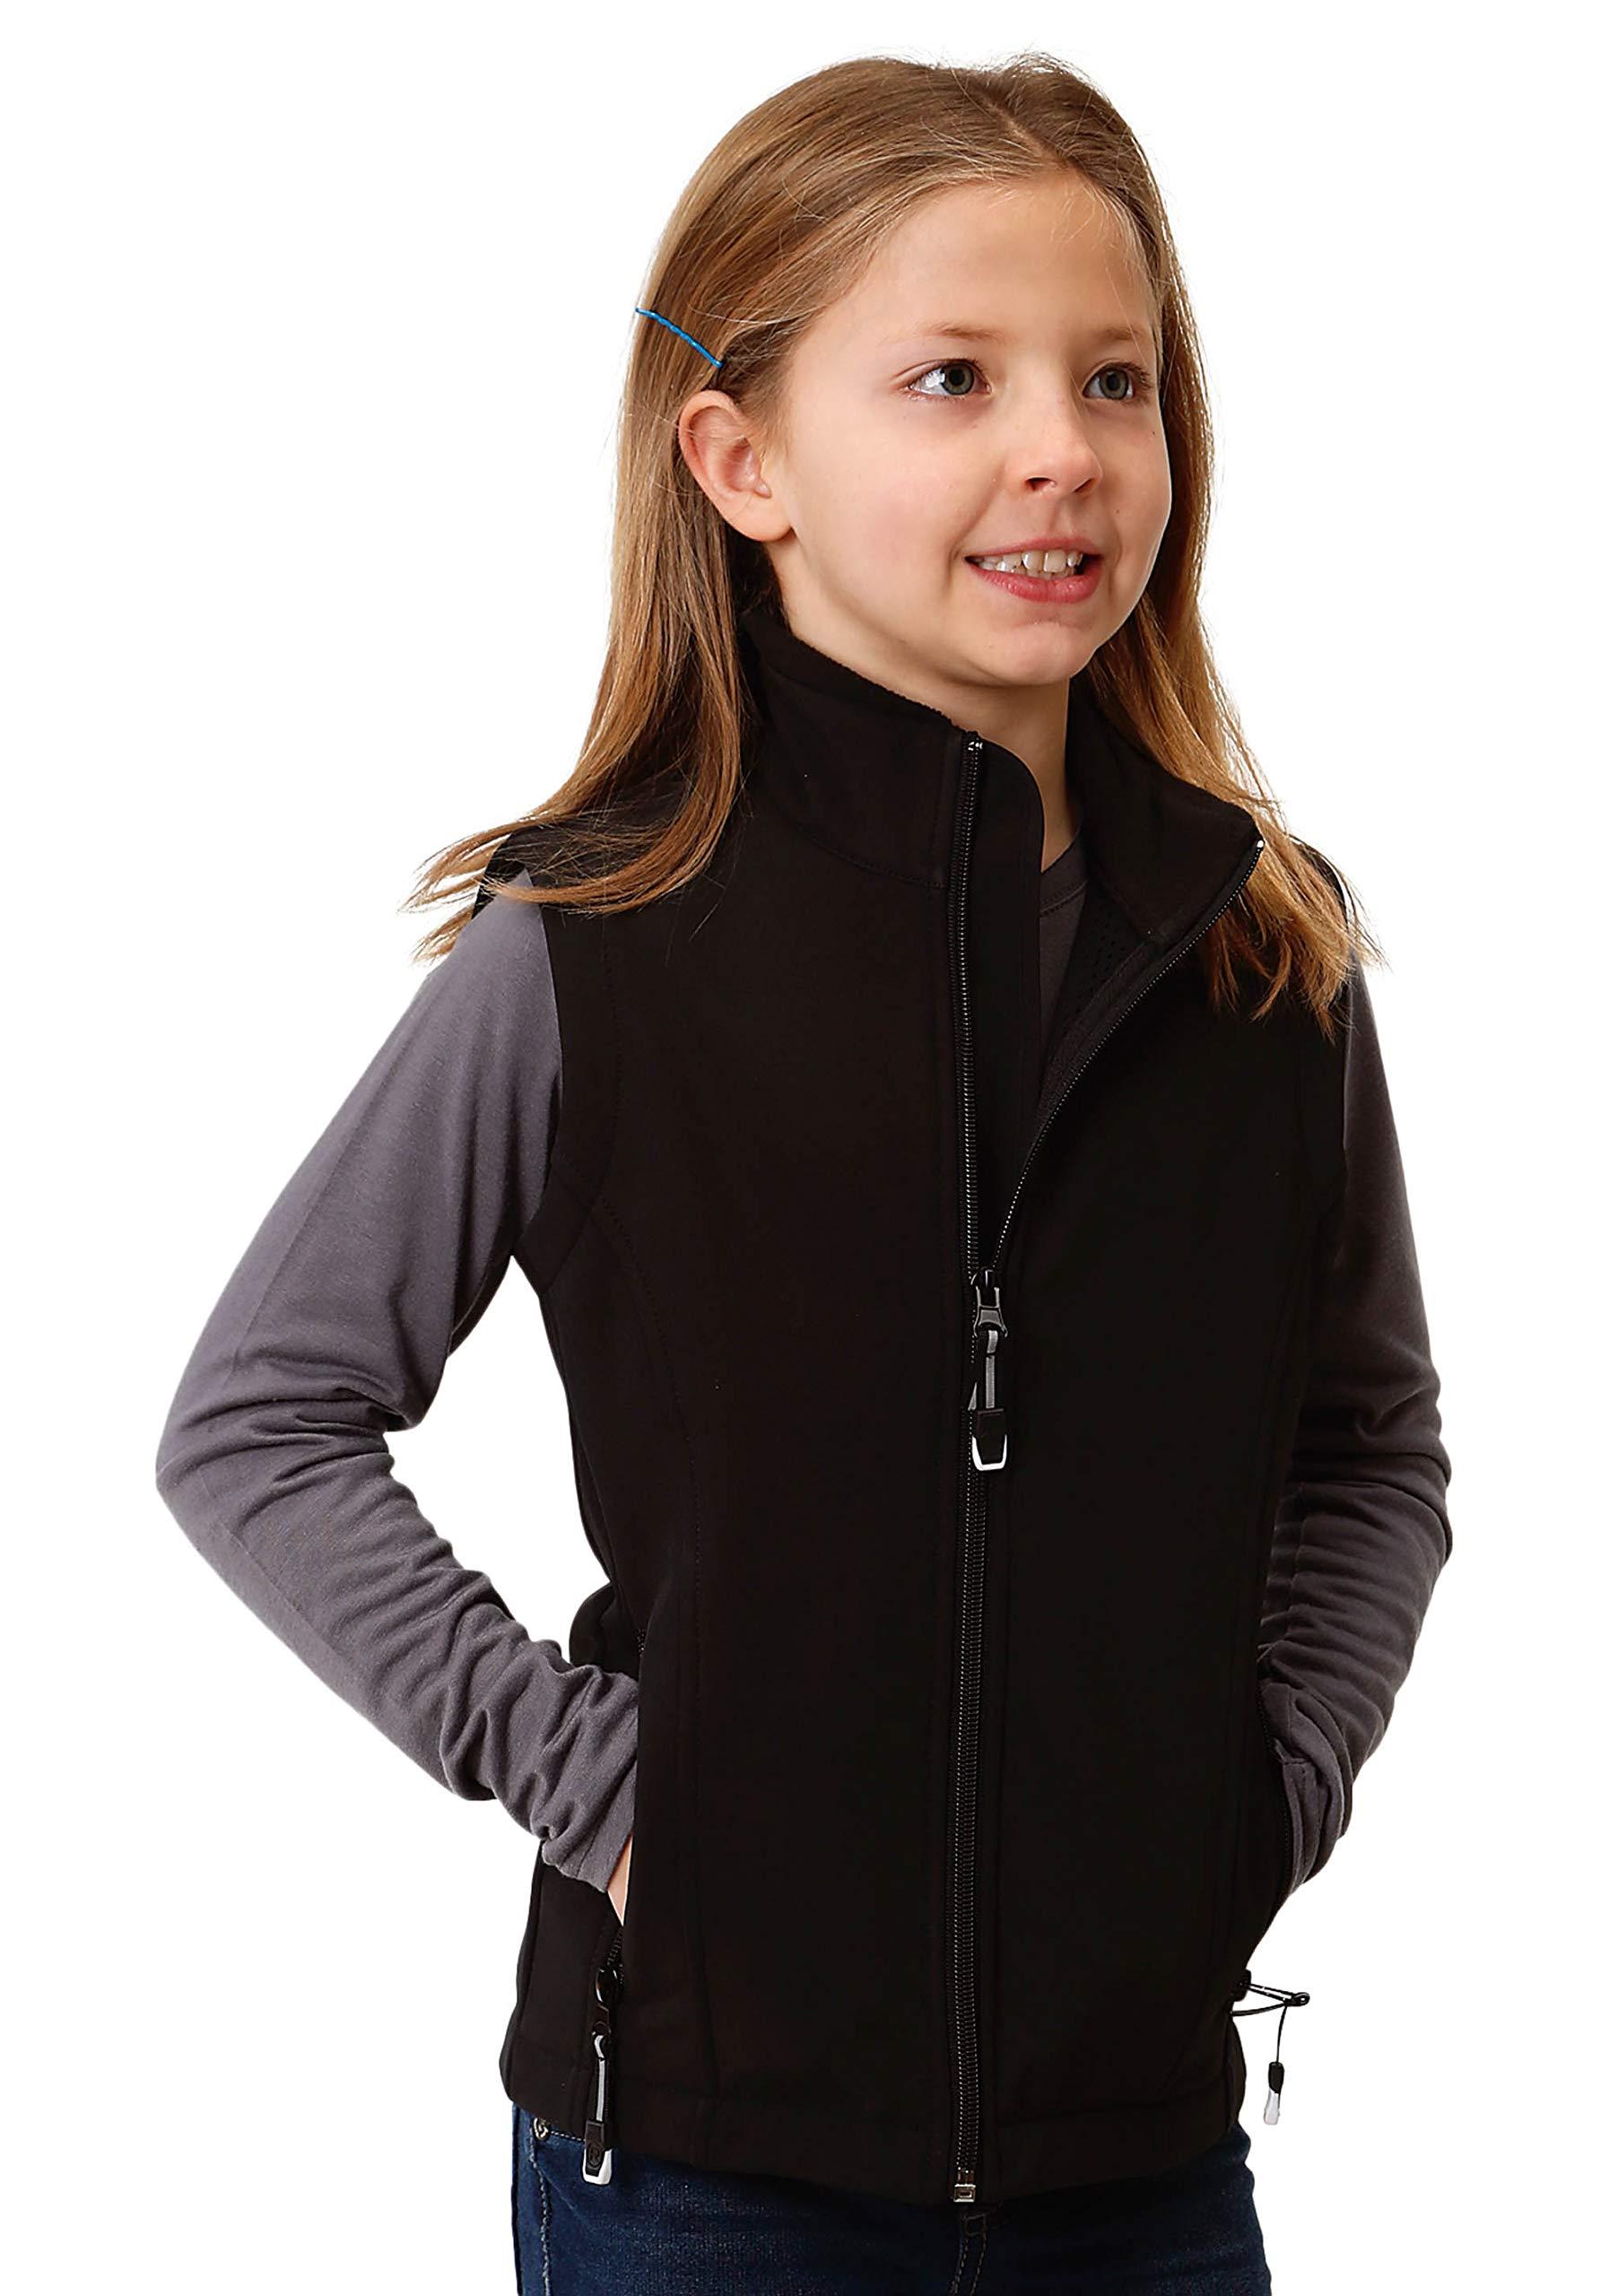 Roper Girls' Outerwear Vest 0781-7004, Black - Small by Roper